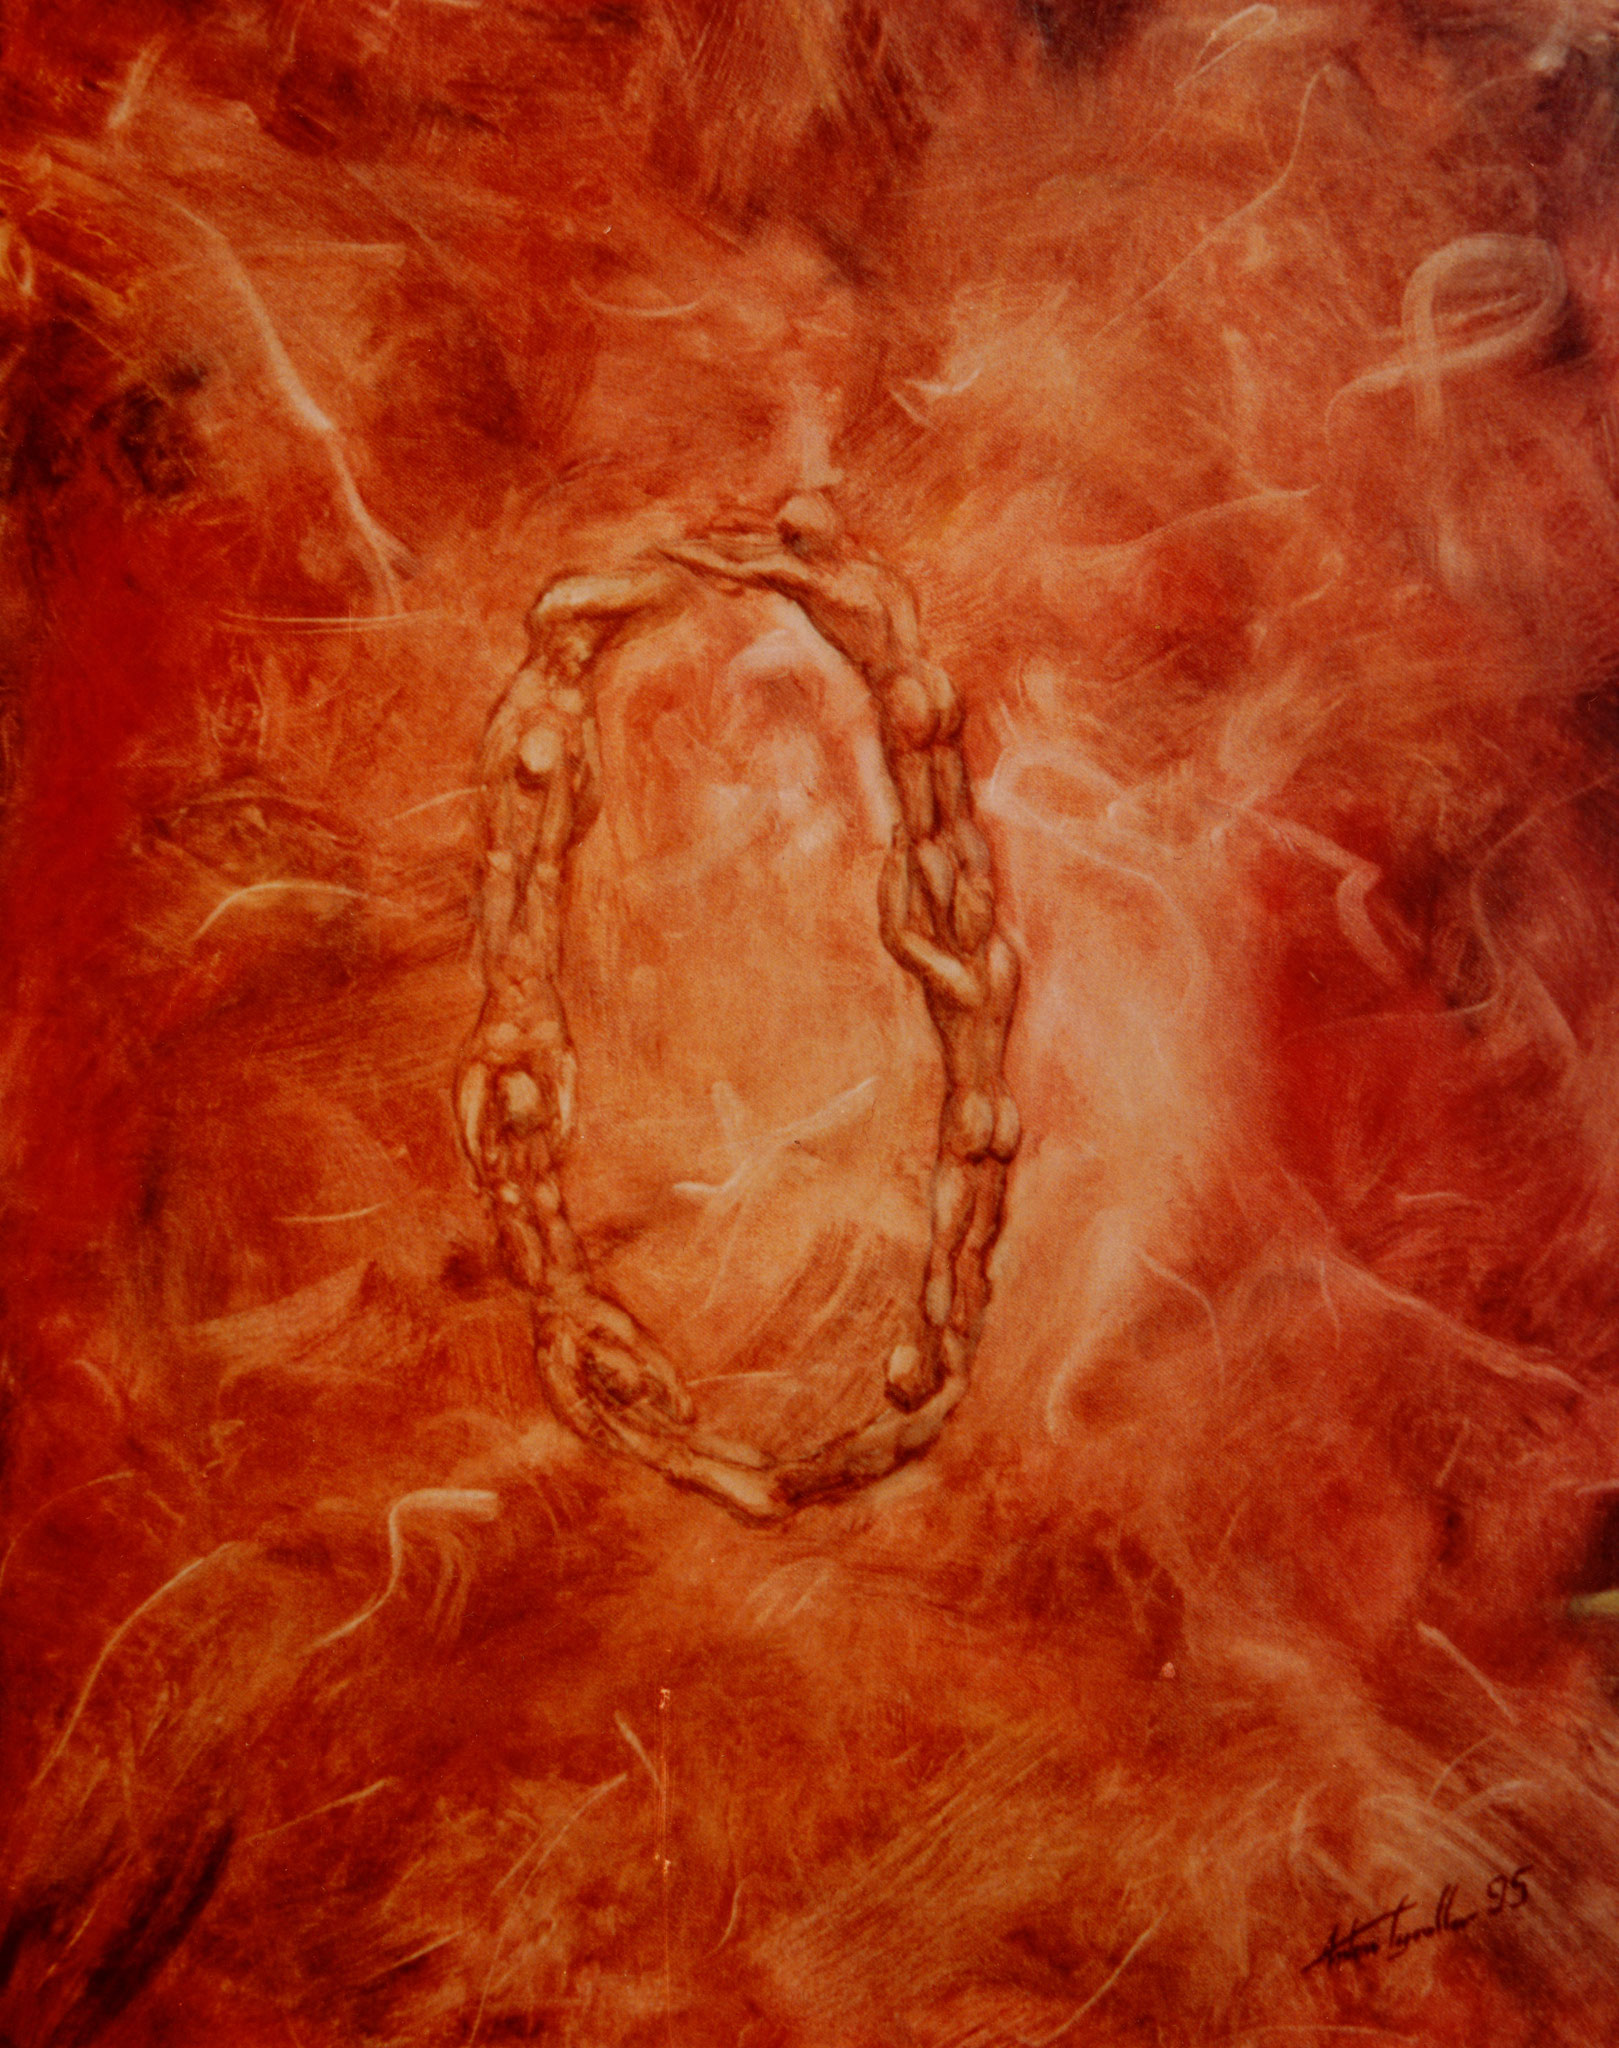 Ring II, 70x55 cm